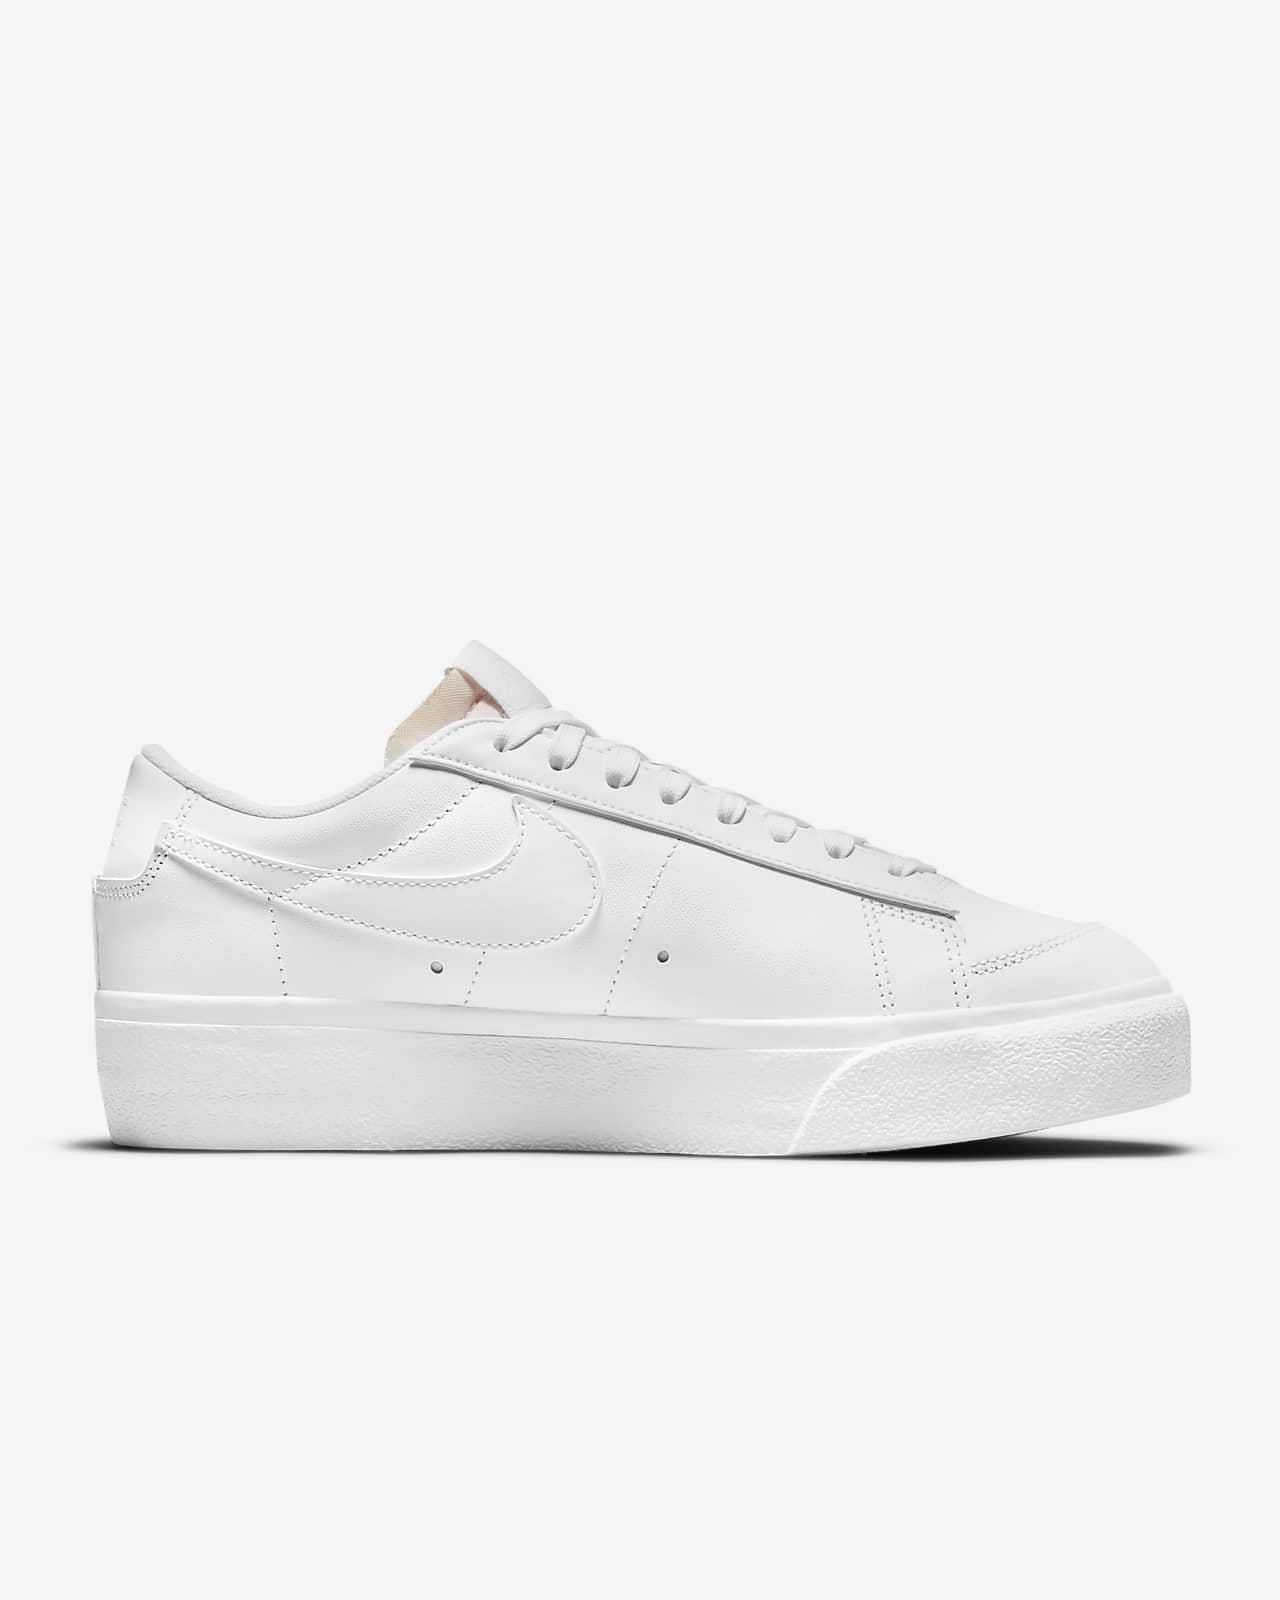 Nike Blazer Low Platform Women's Shoes. Nike LU